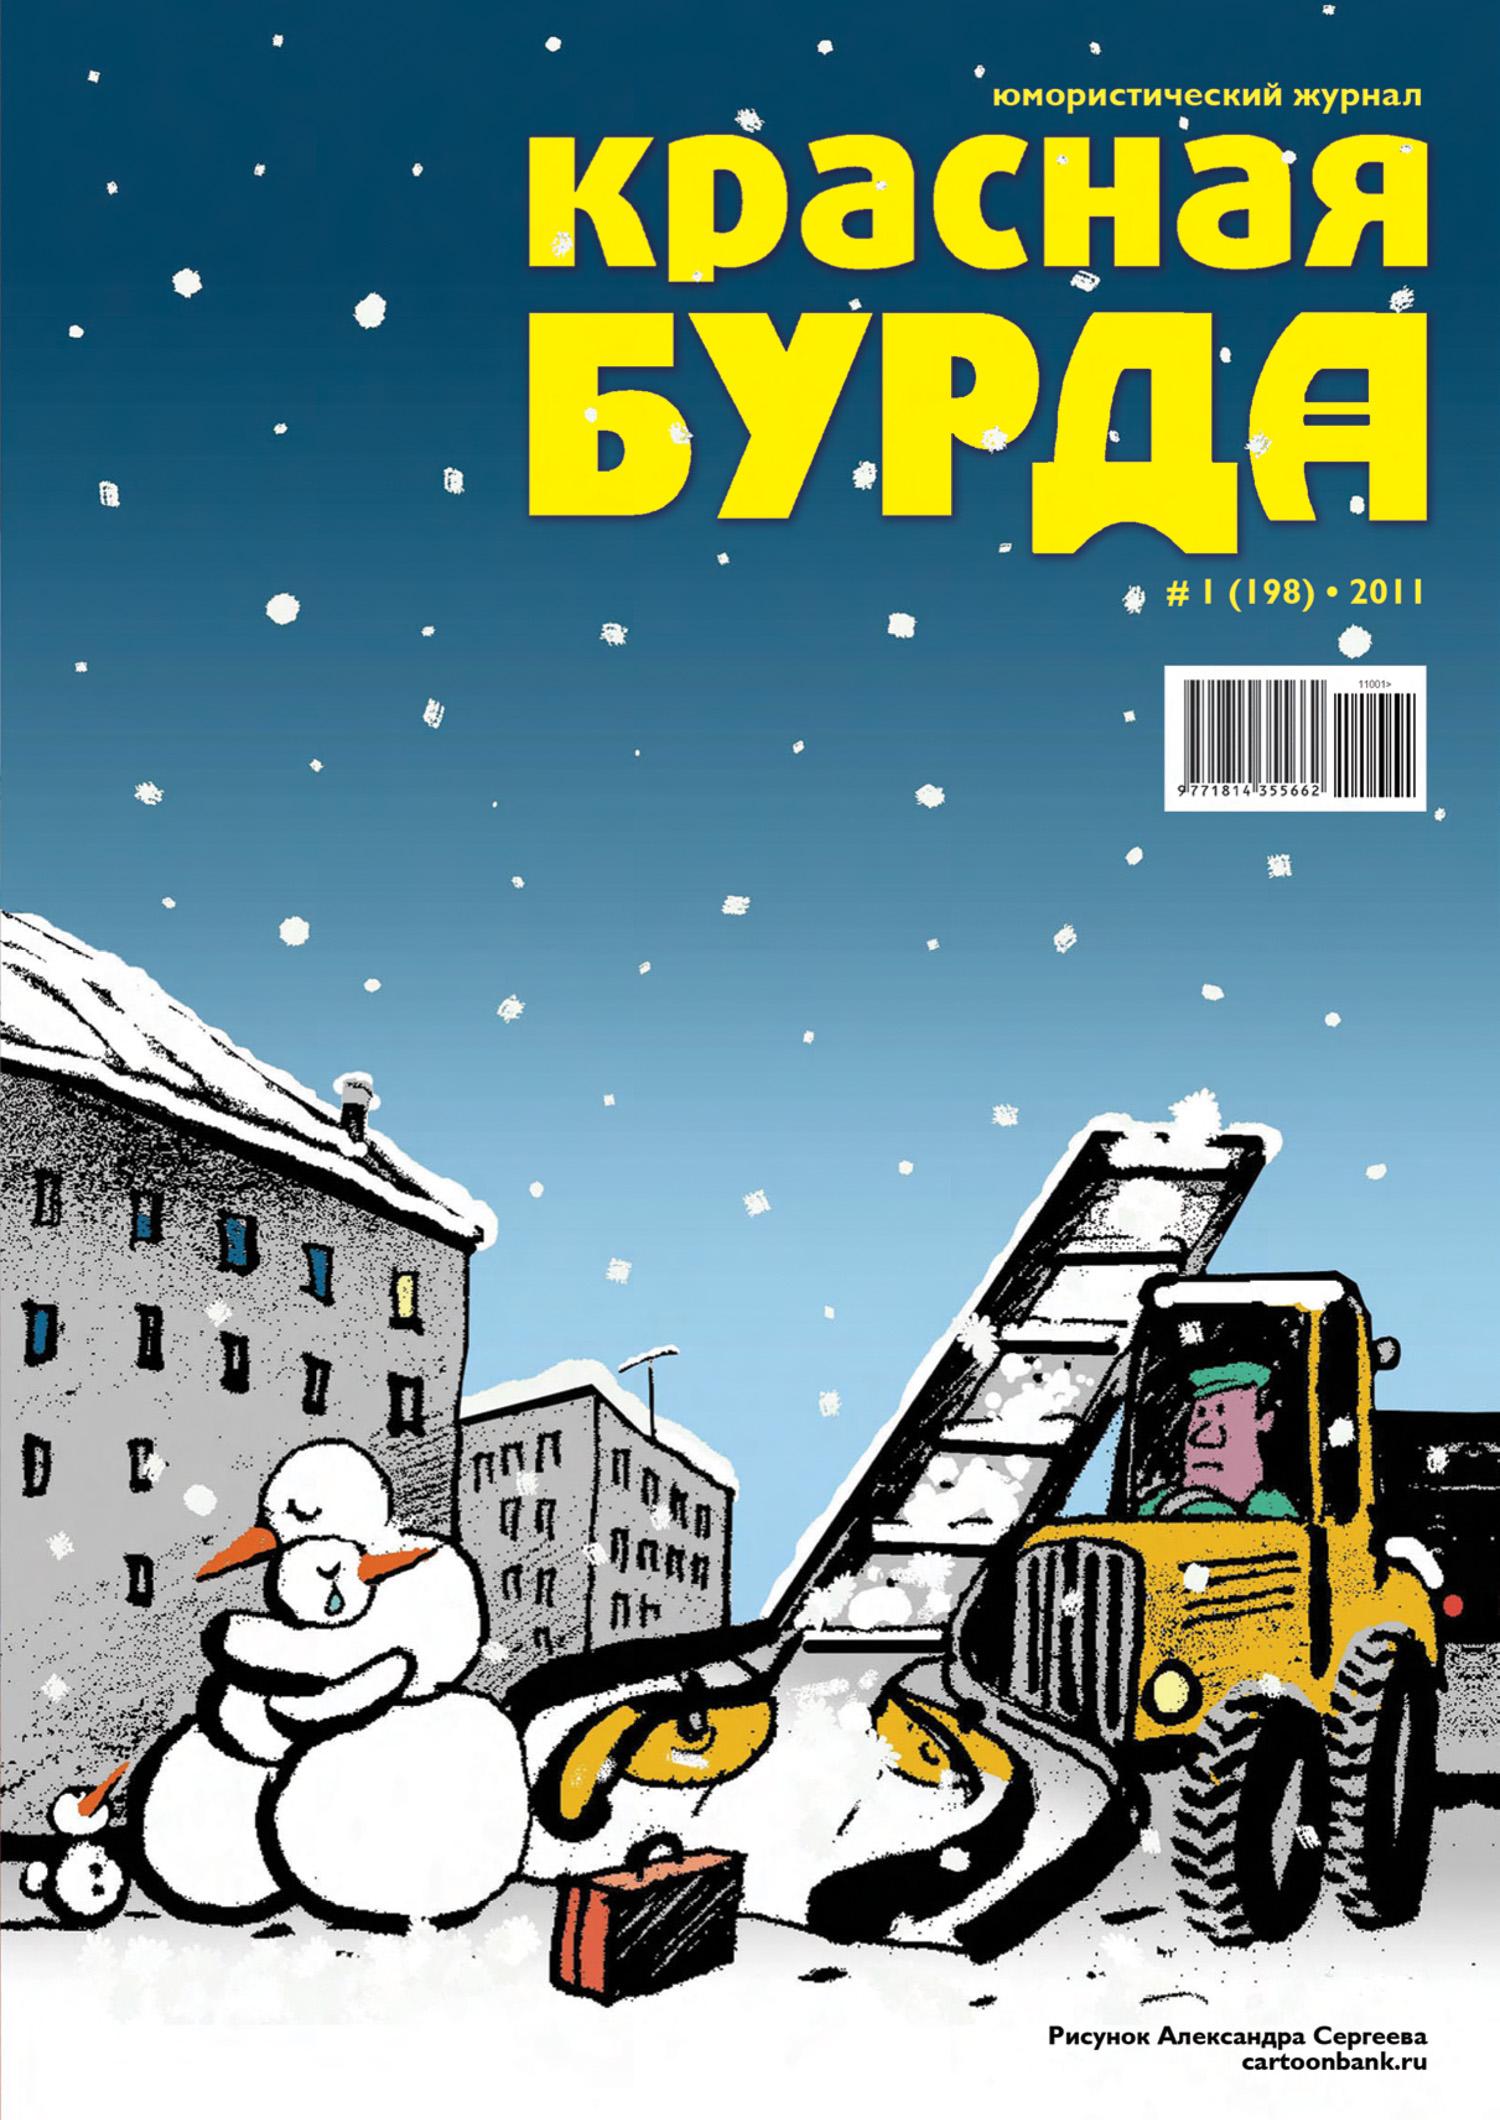 Красная бурда. Юмористический журнал №1 (198) 2011